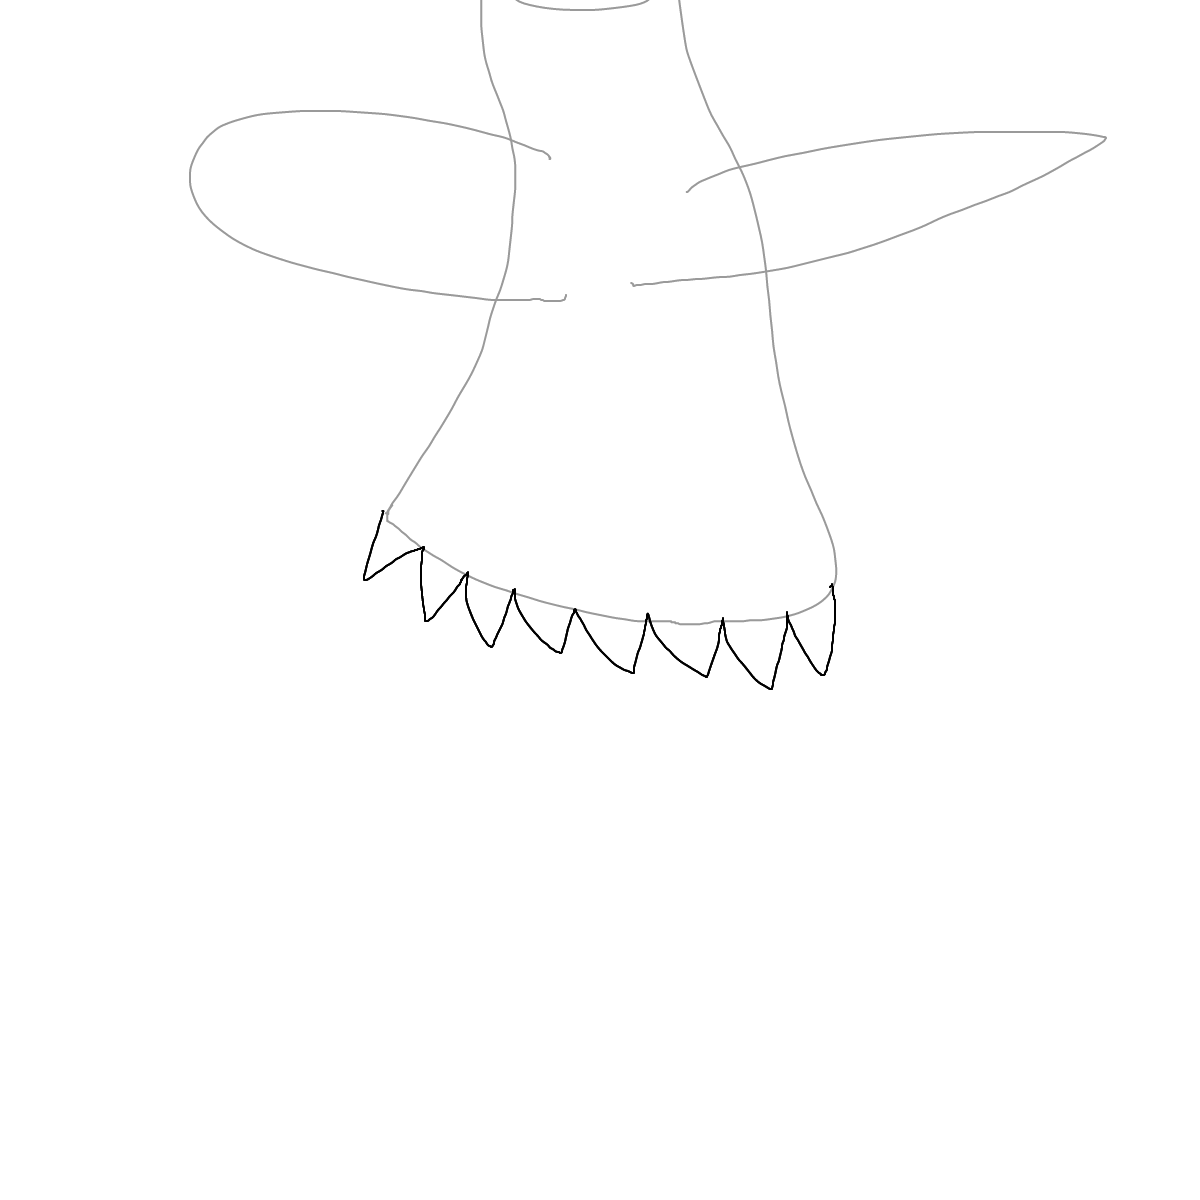 BAAAM drawing#9 lat:16.7474250793457030lng: -93.0832443237304700